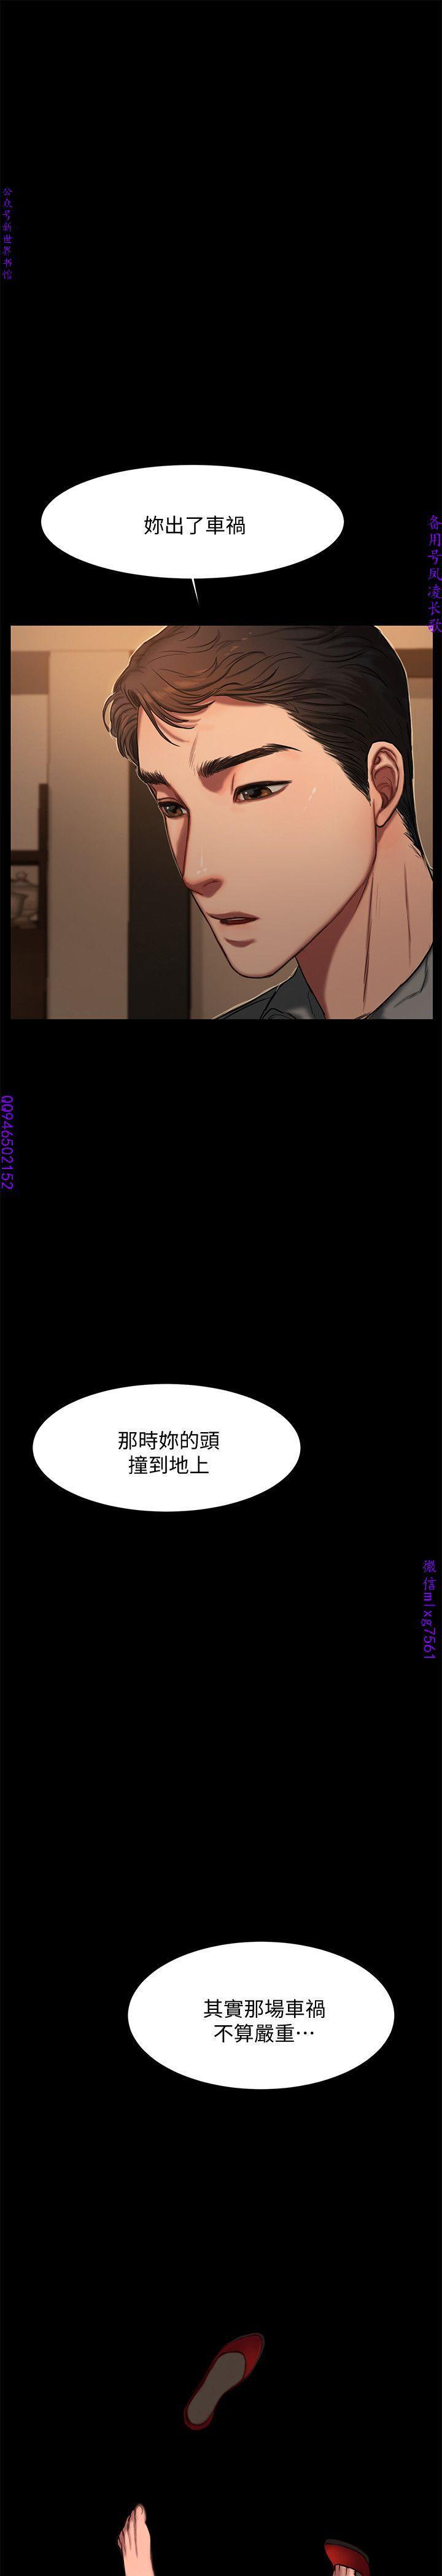 Run away 1-10【中文】 82